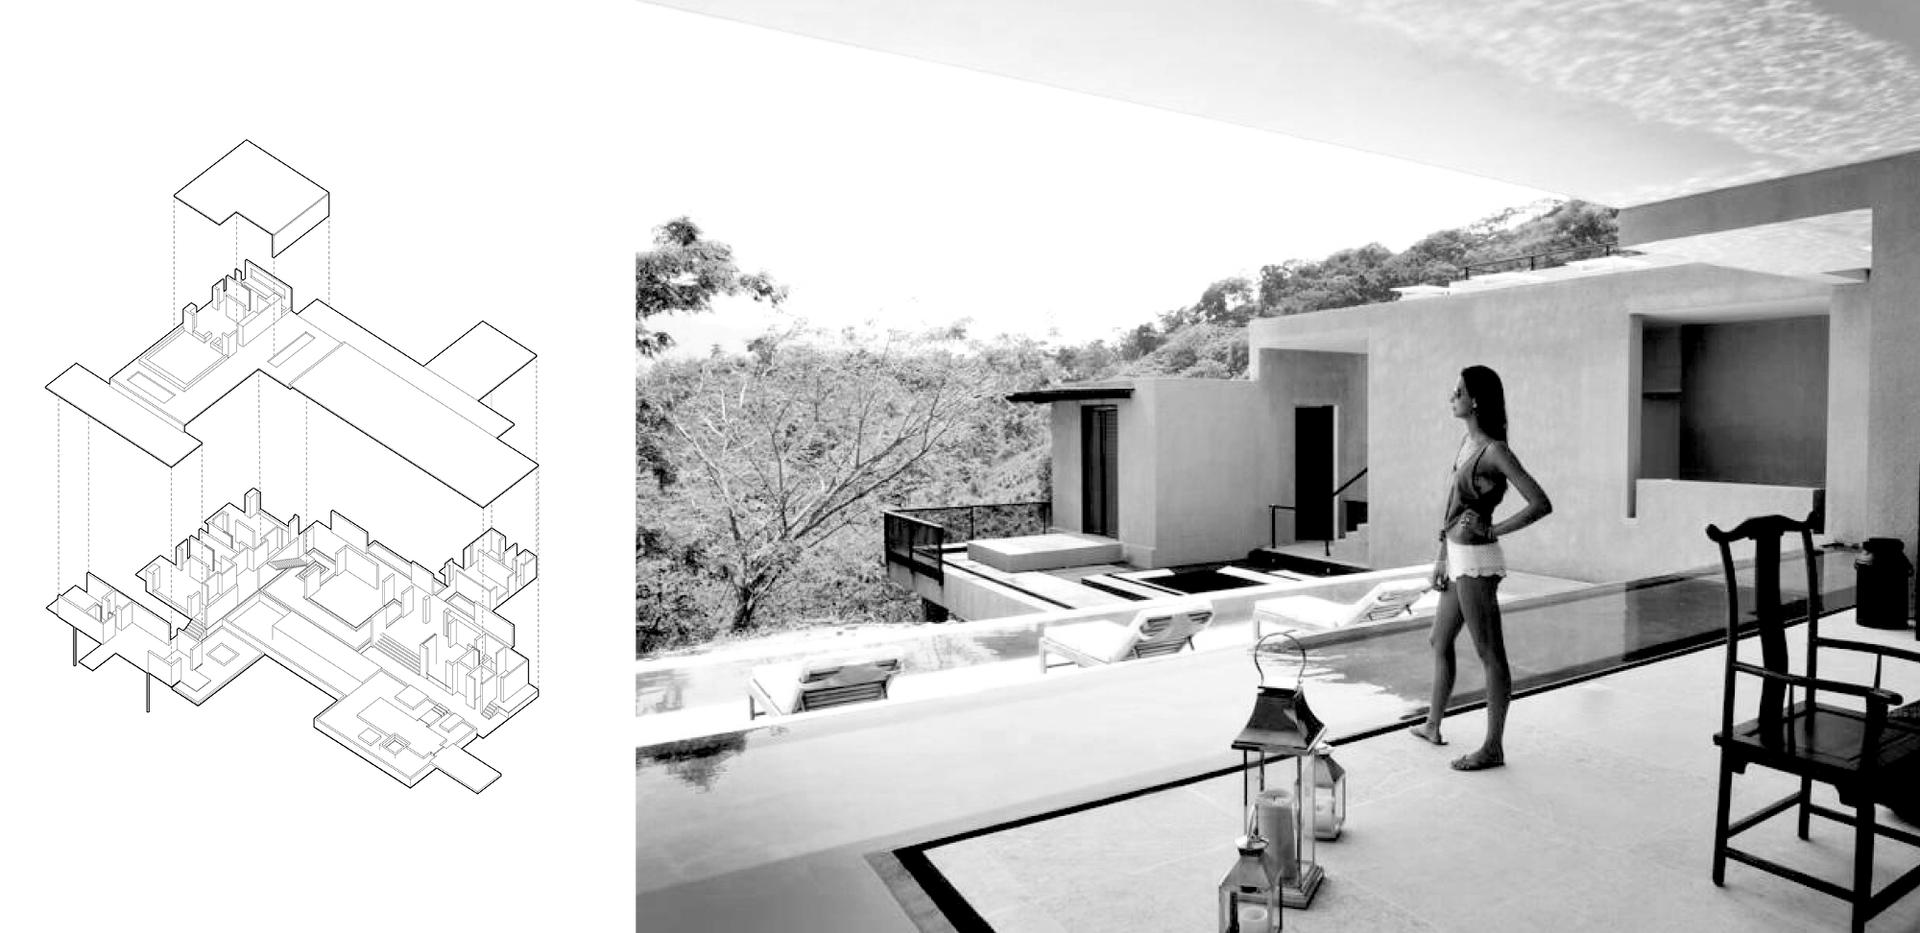 Villas Payande_Andres Arias_Pico Velasquez-3